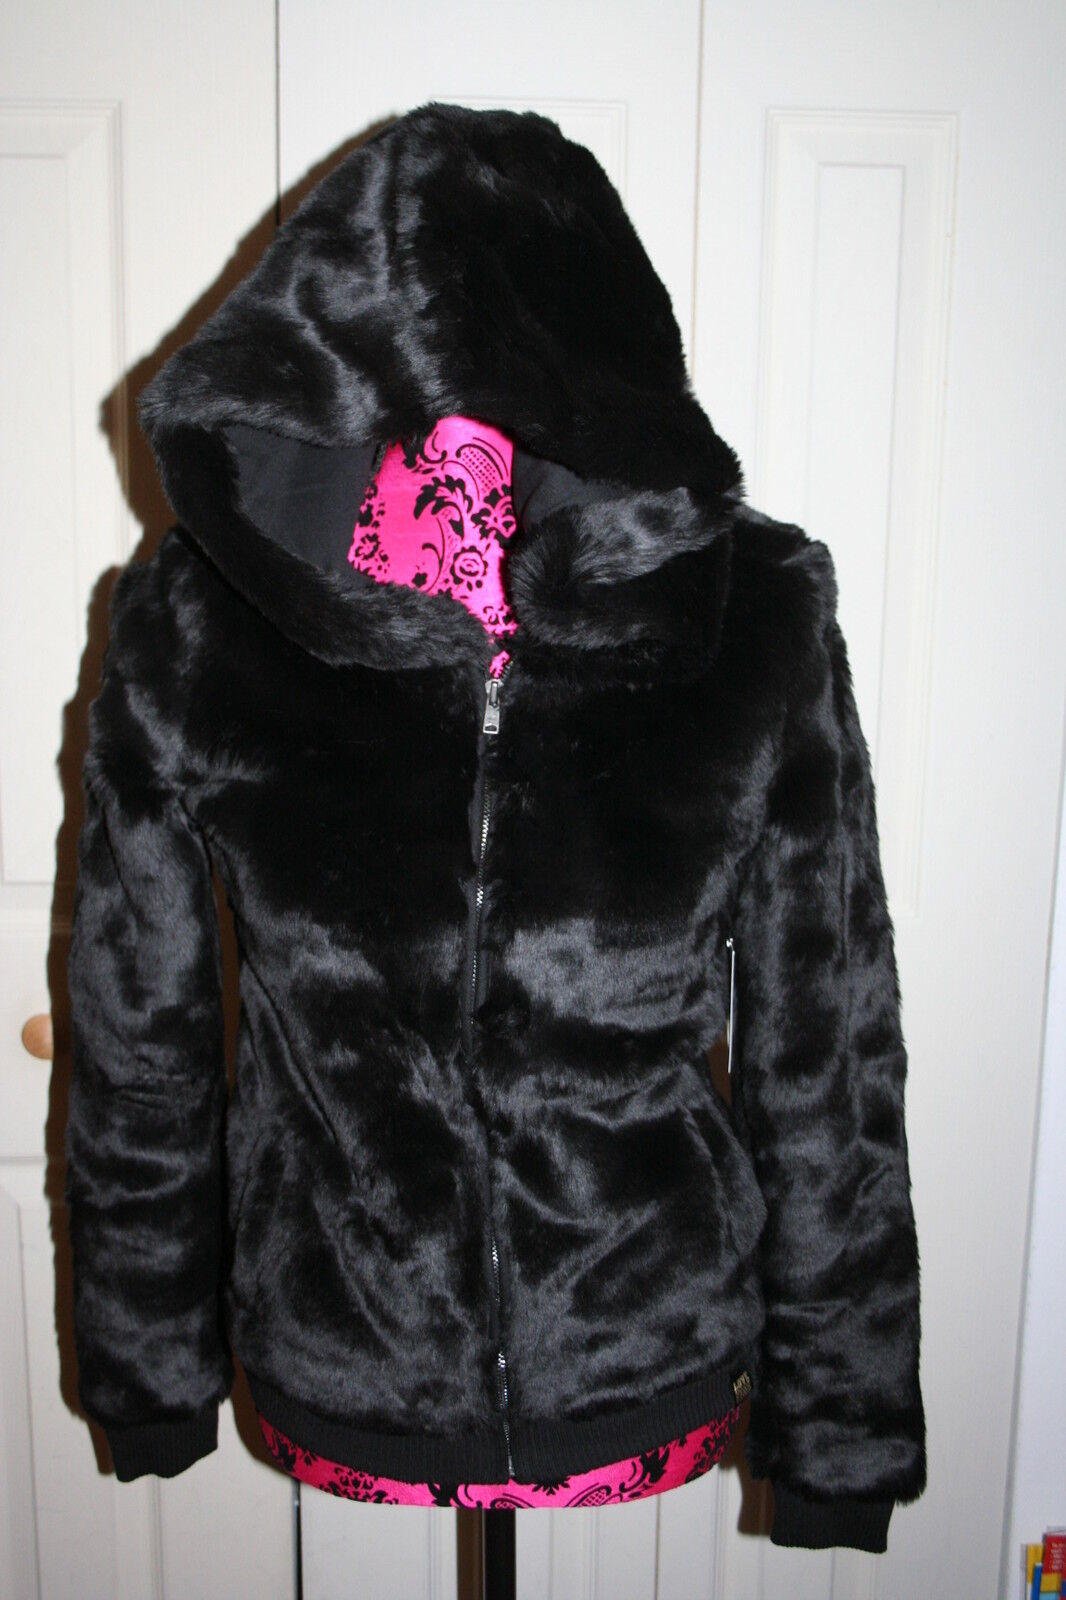 Victoria's Secret Love Pink Faux Fur Zip Hoodie Fashion Show Xs Jacket Black